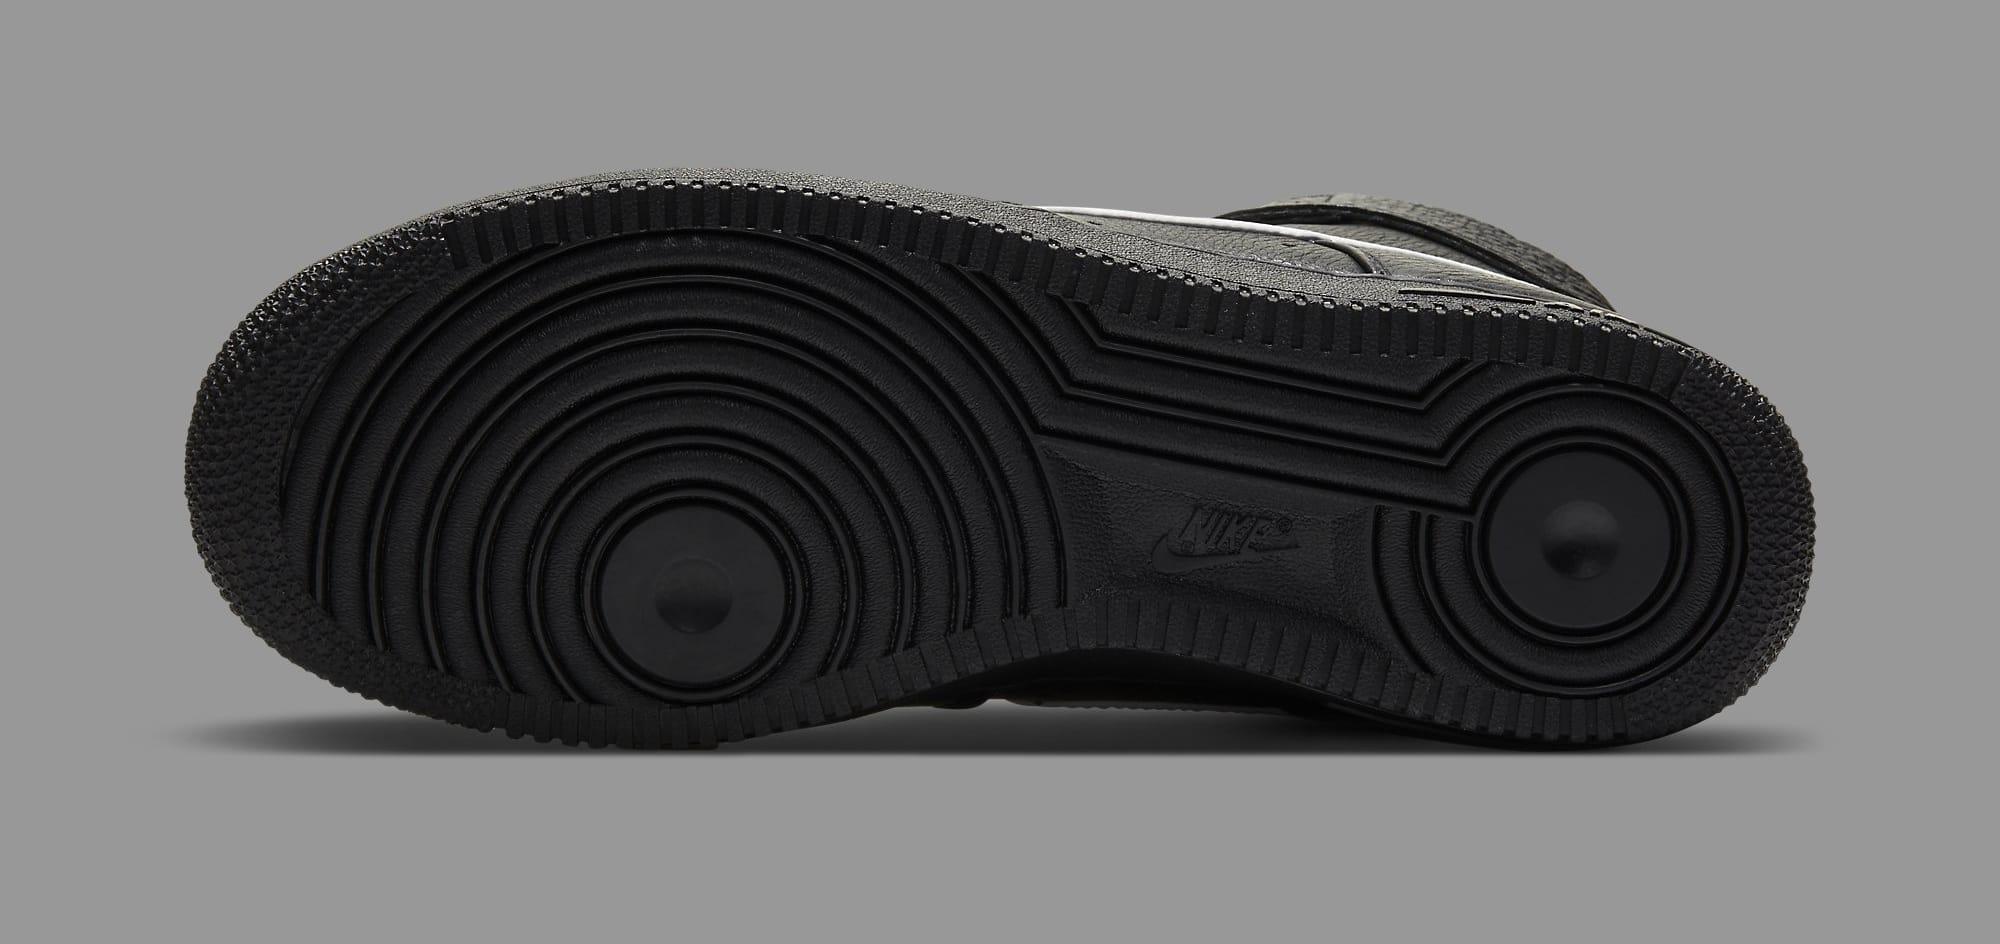 Alyx x Nike Air Force 1 High CQ4018-002 Outsole